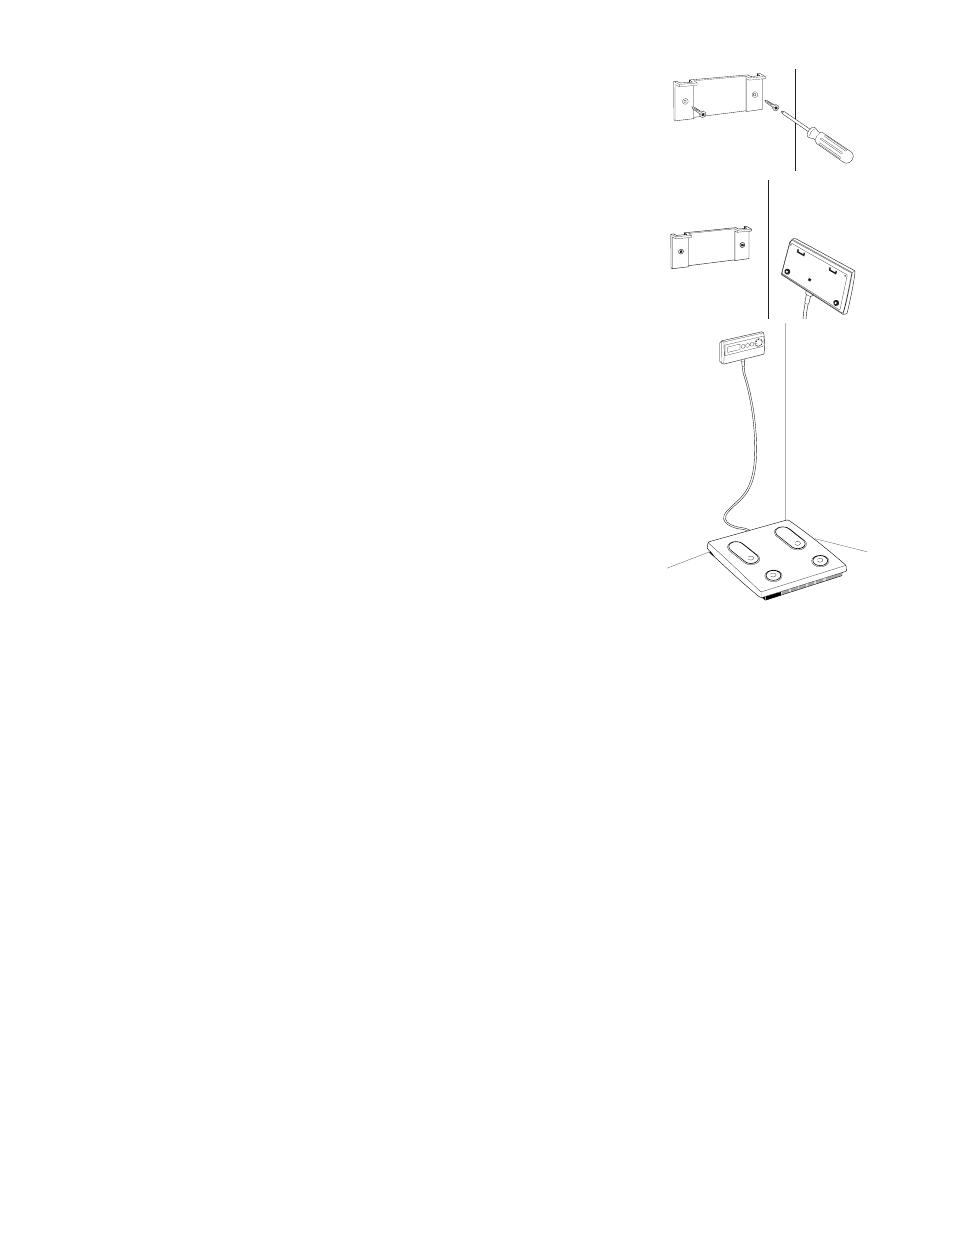 handling tips installing the display box tanita tbf 521 user rh manualsdir com